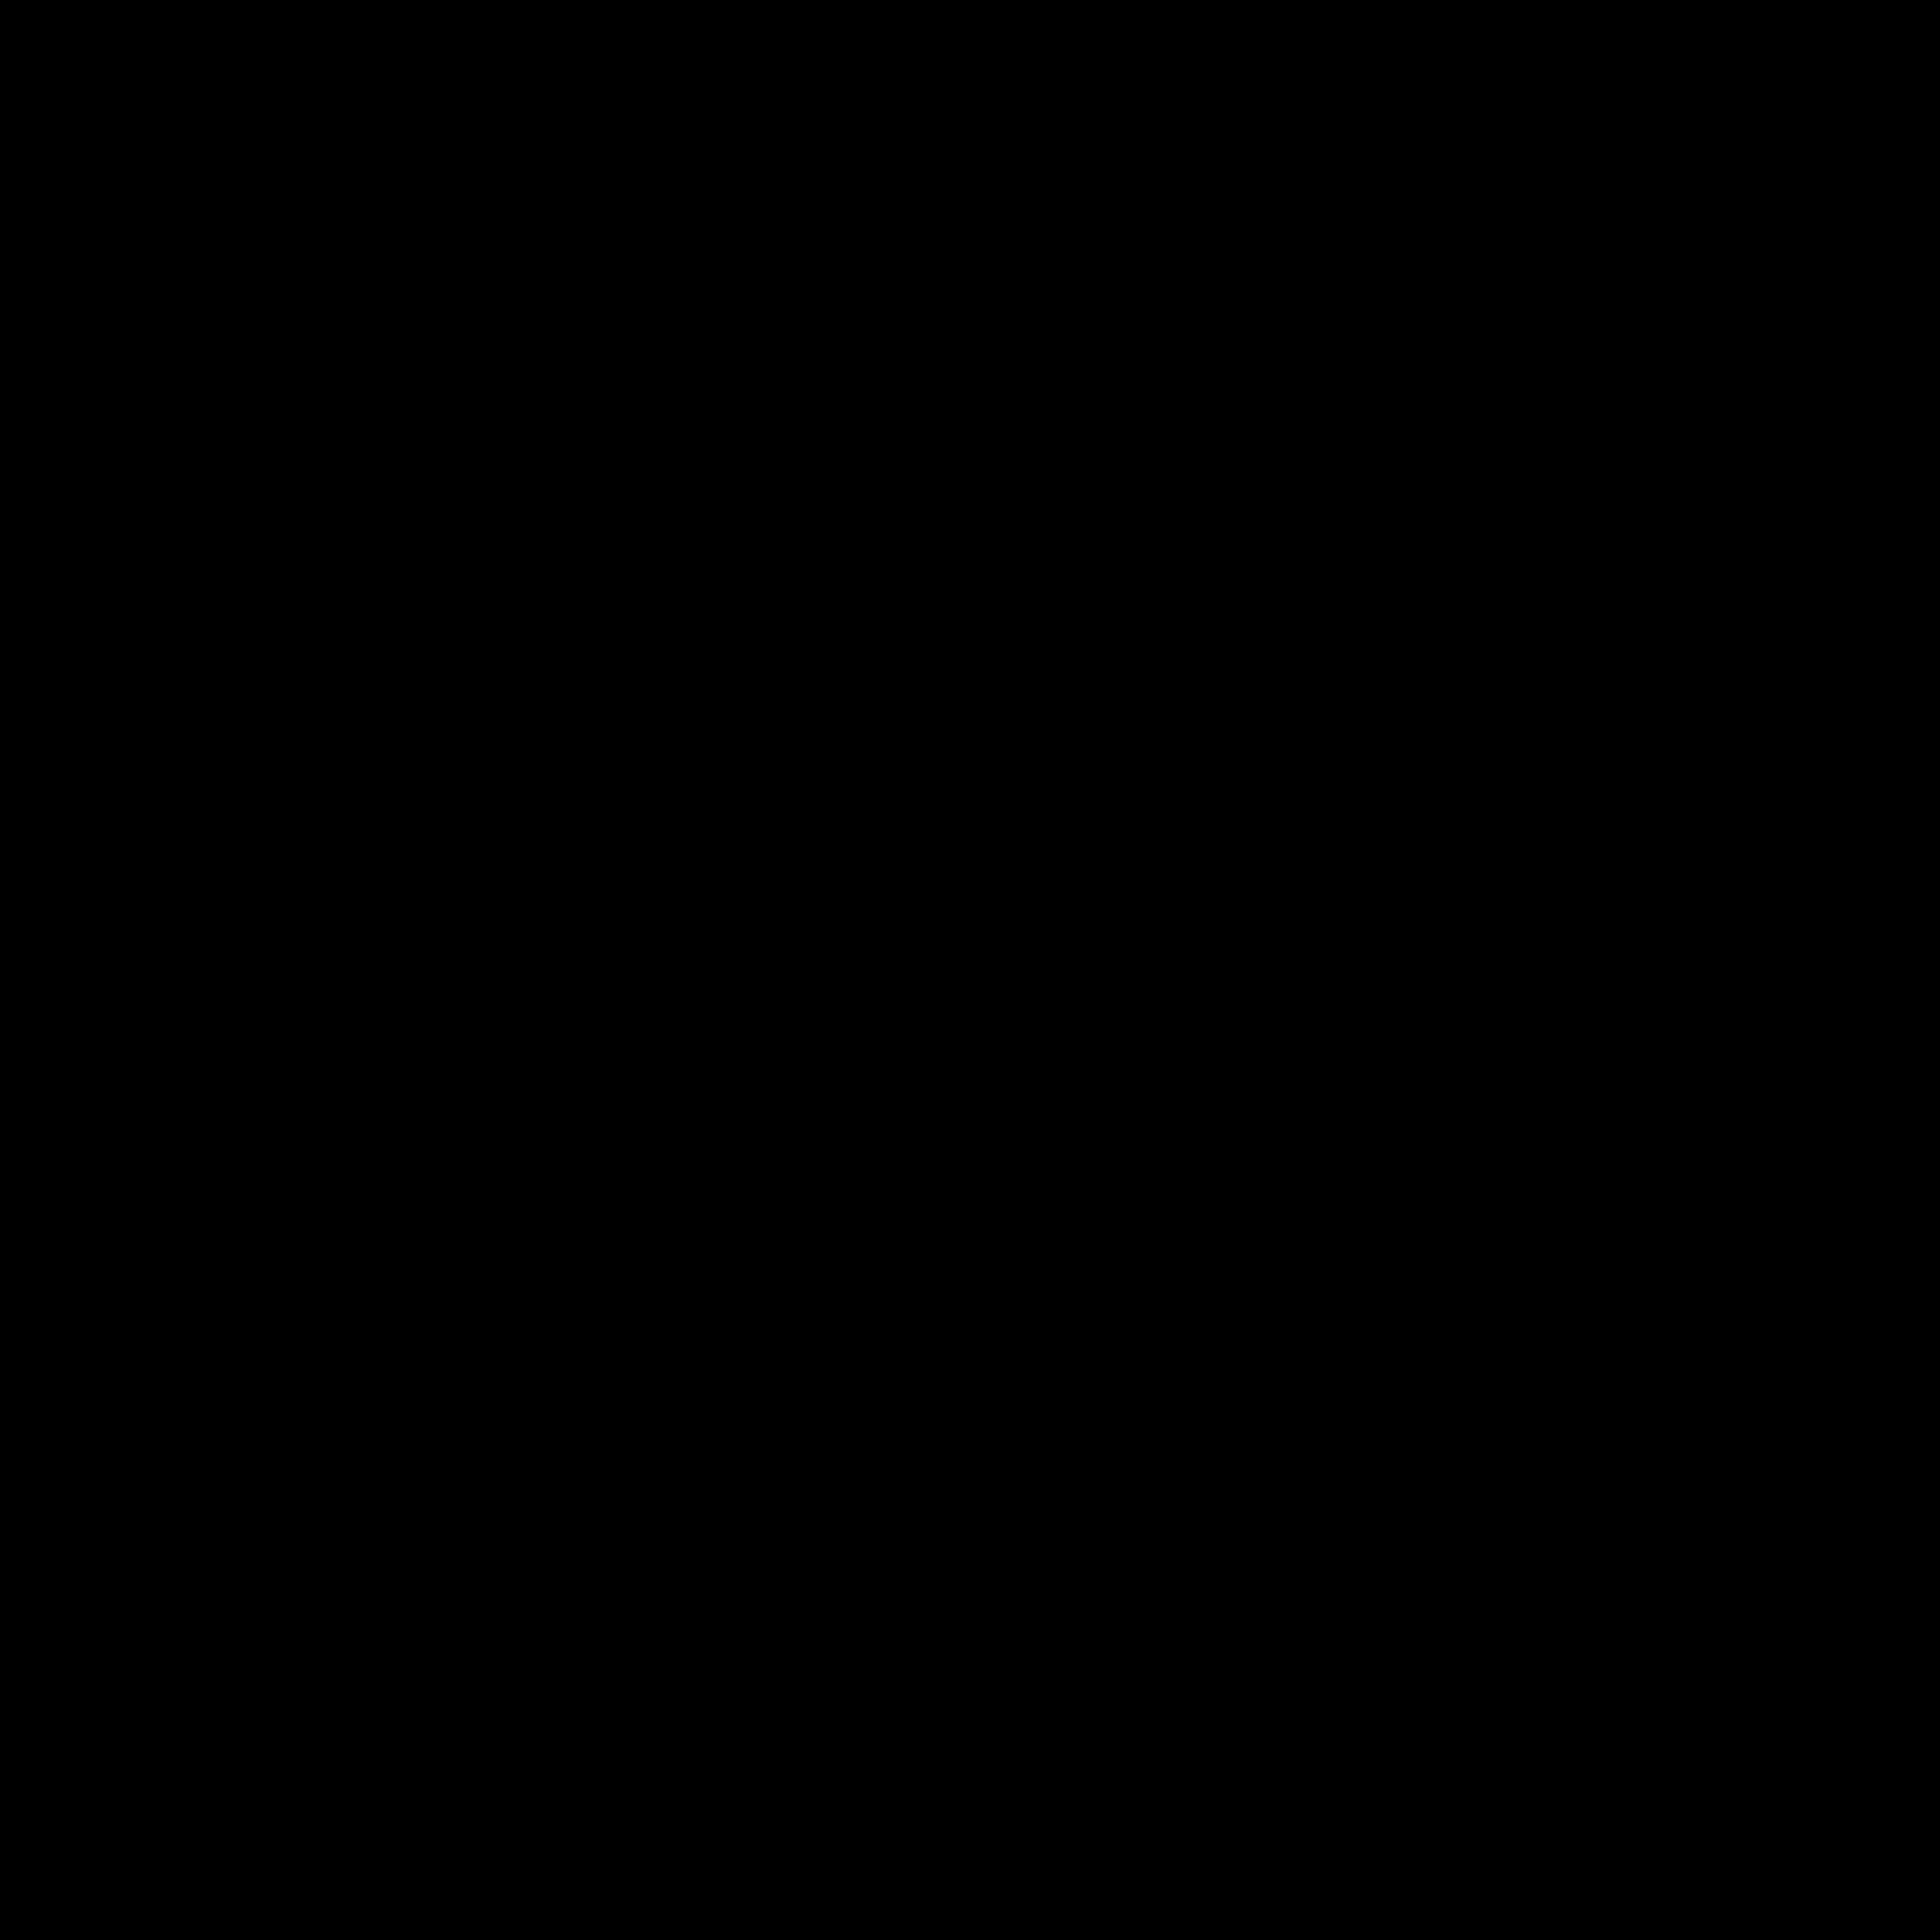 Сумка велика чорна із плащової тканини 12353